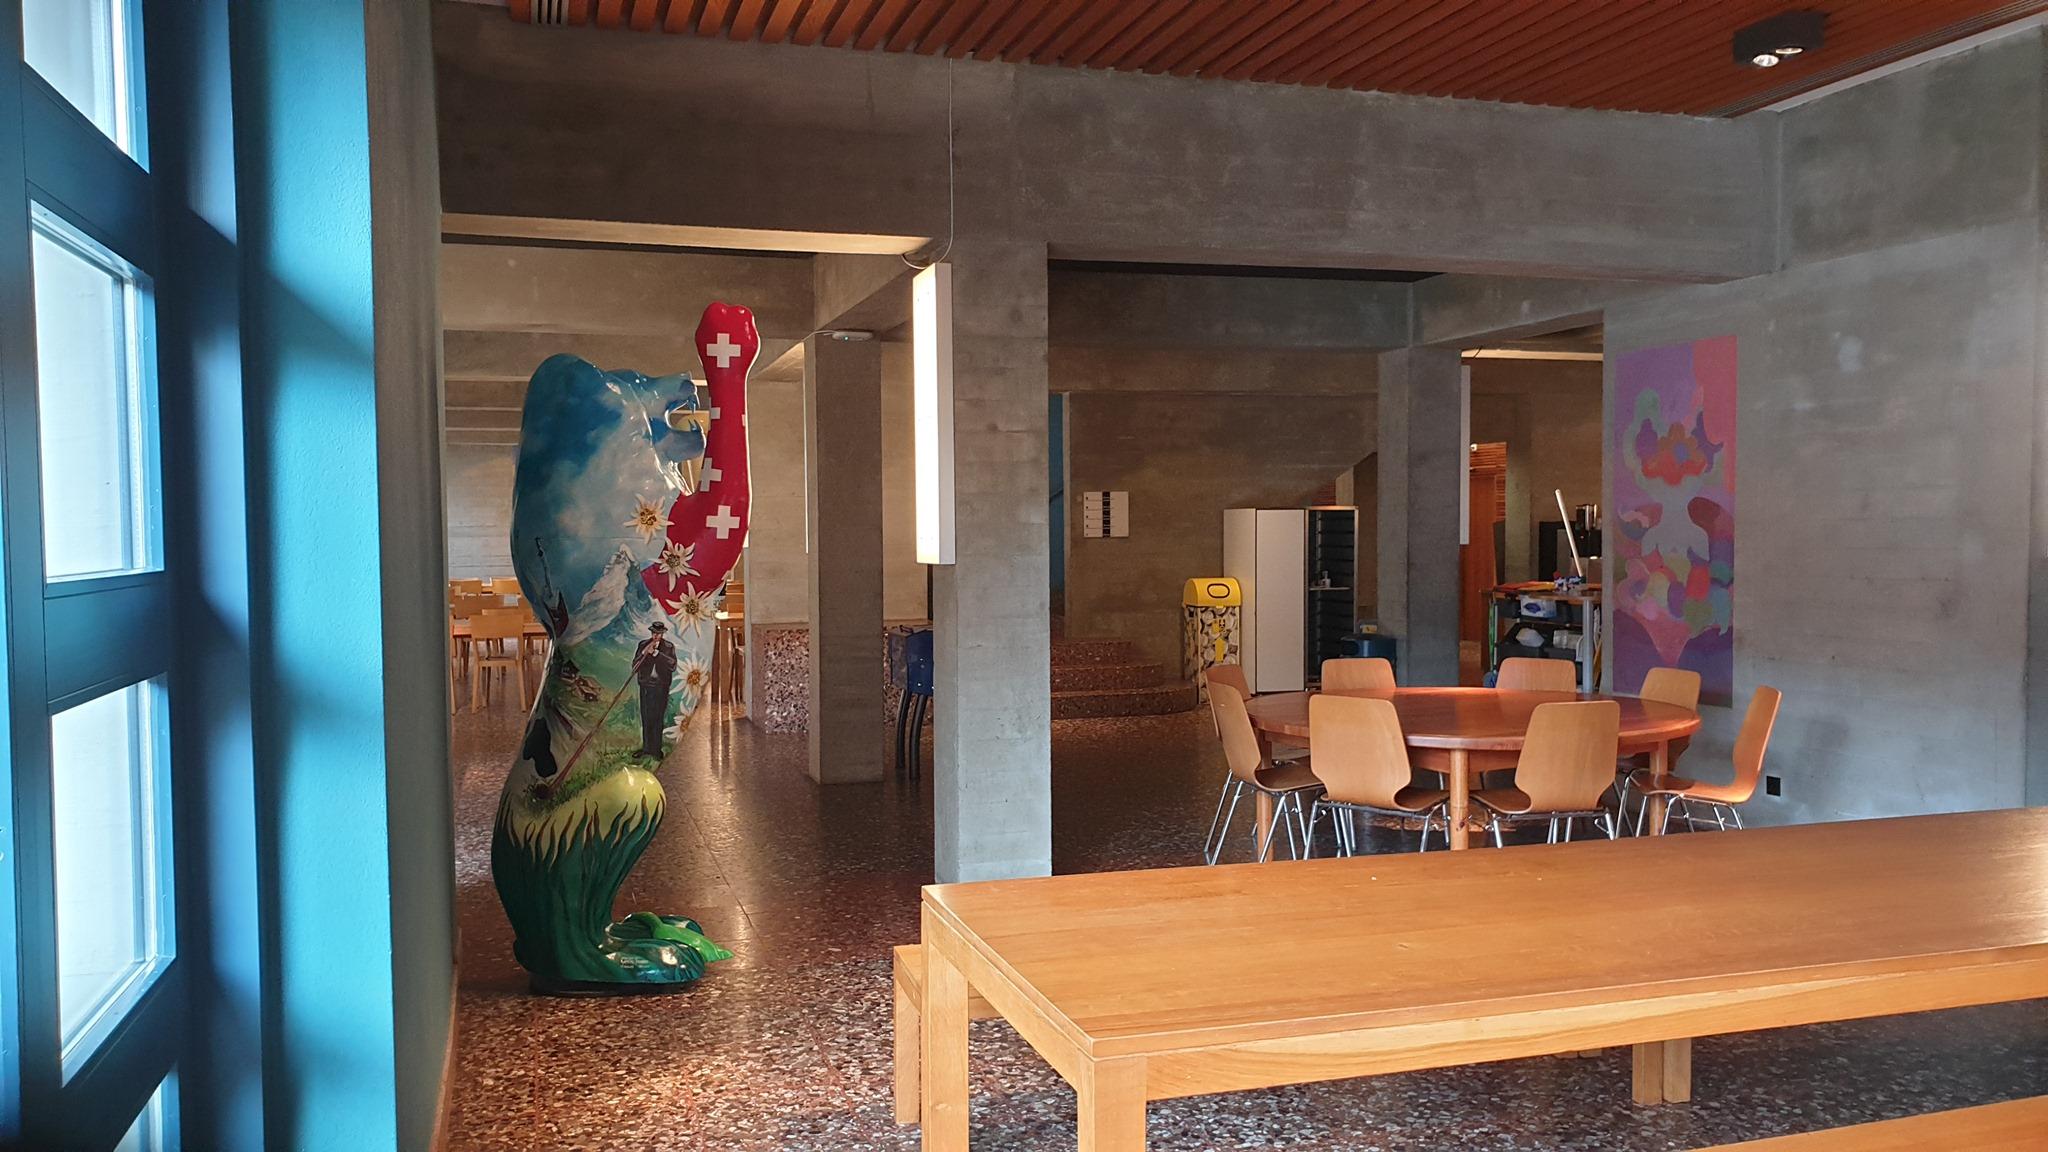 Die Lobby der Jugendherberge Zürich mit Löwe